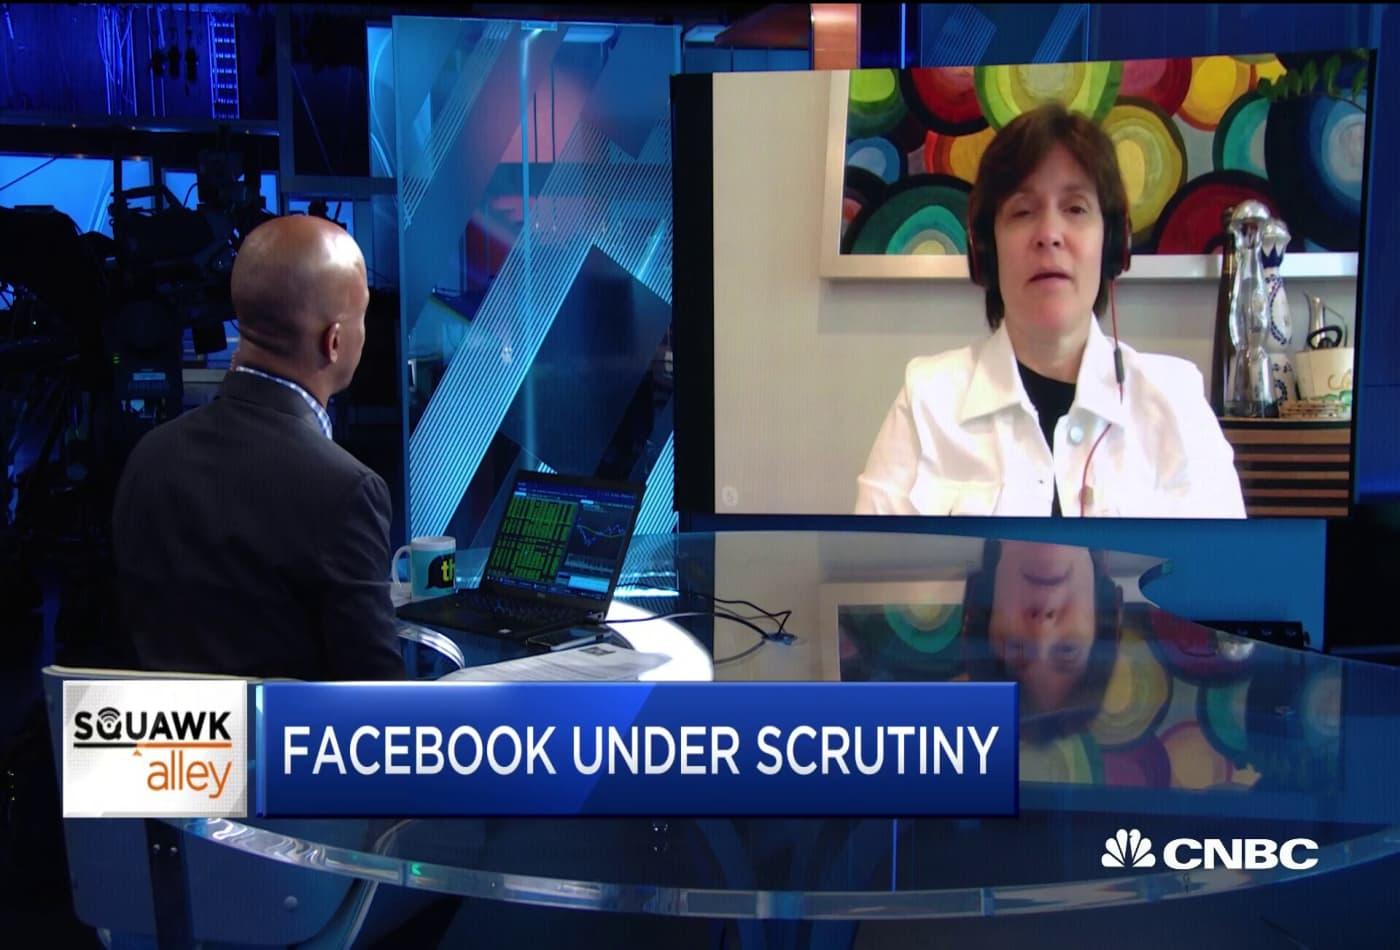 Kara Swisher: Wall Street is rewarding Facebook's leadership in ads despite controversy